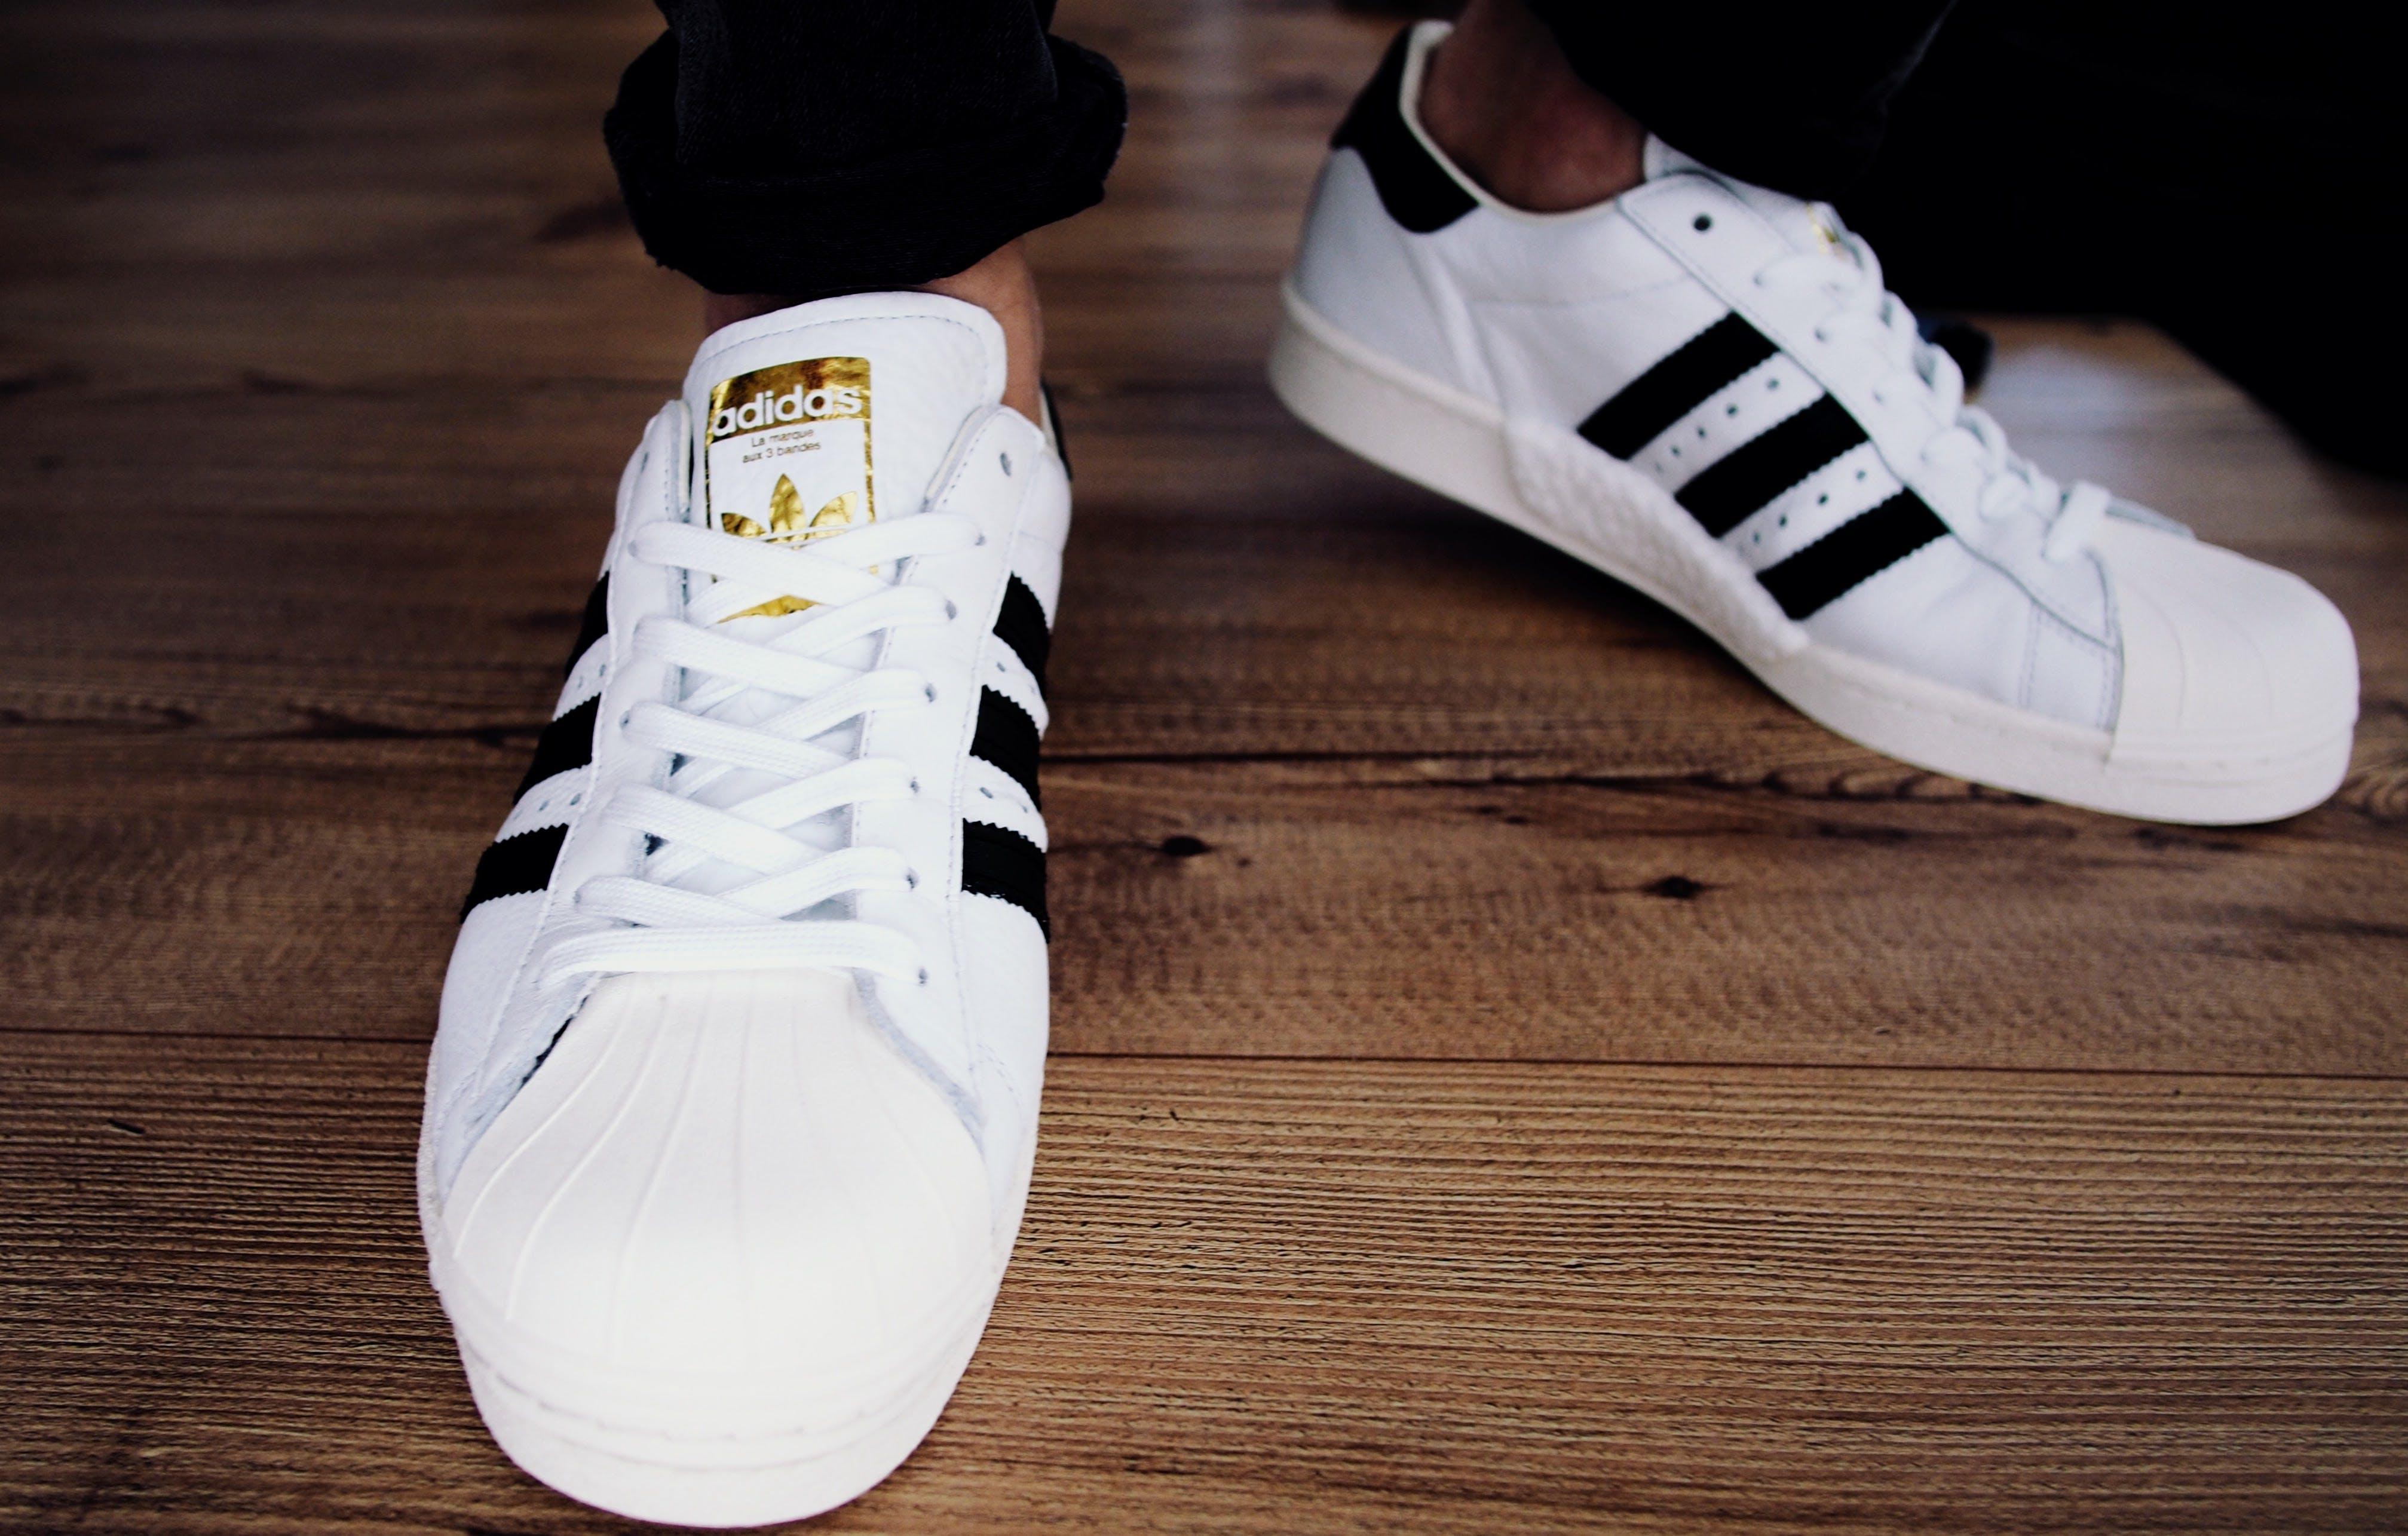 Pair of White-and-black Adidas Superstars